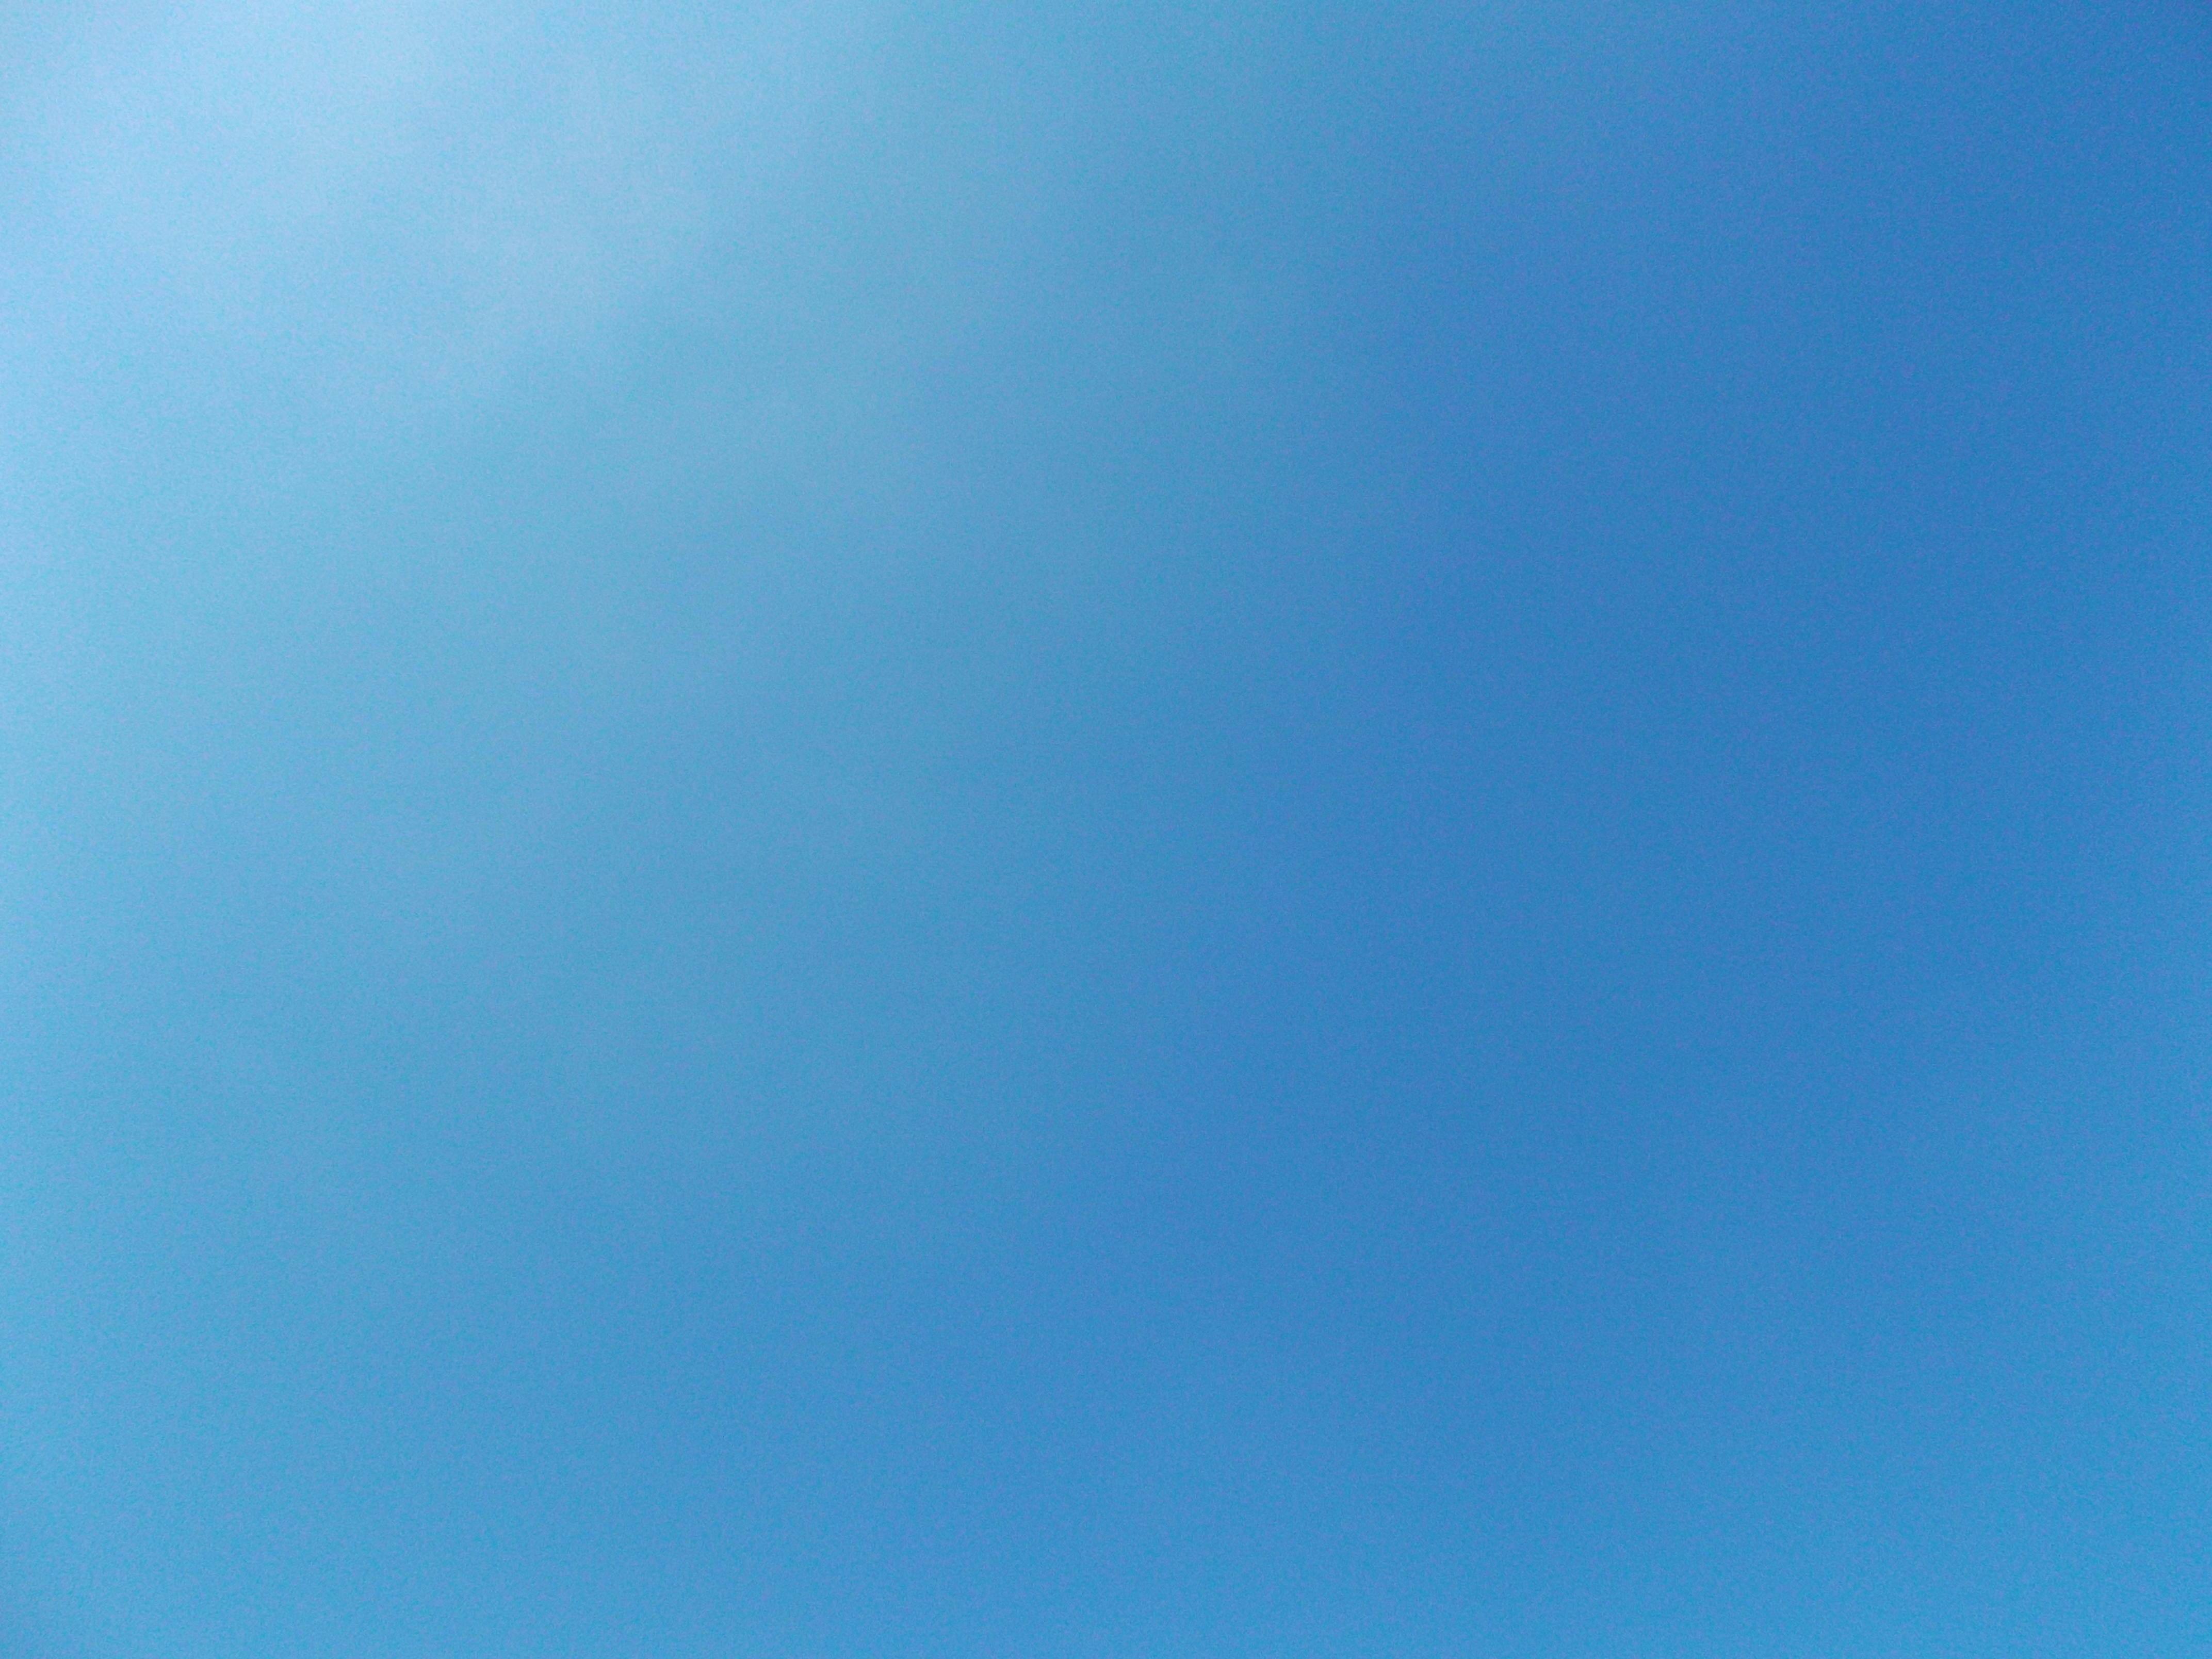 2013-04-20 Longitude -0.371 Latitude 49.182 Altitude 29 Heure 11h00